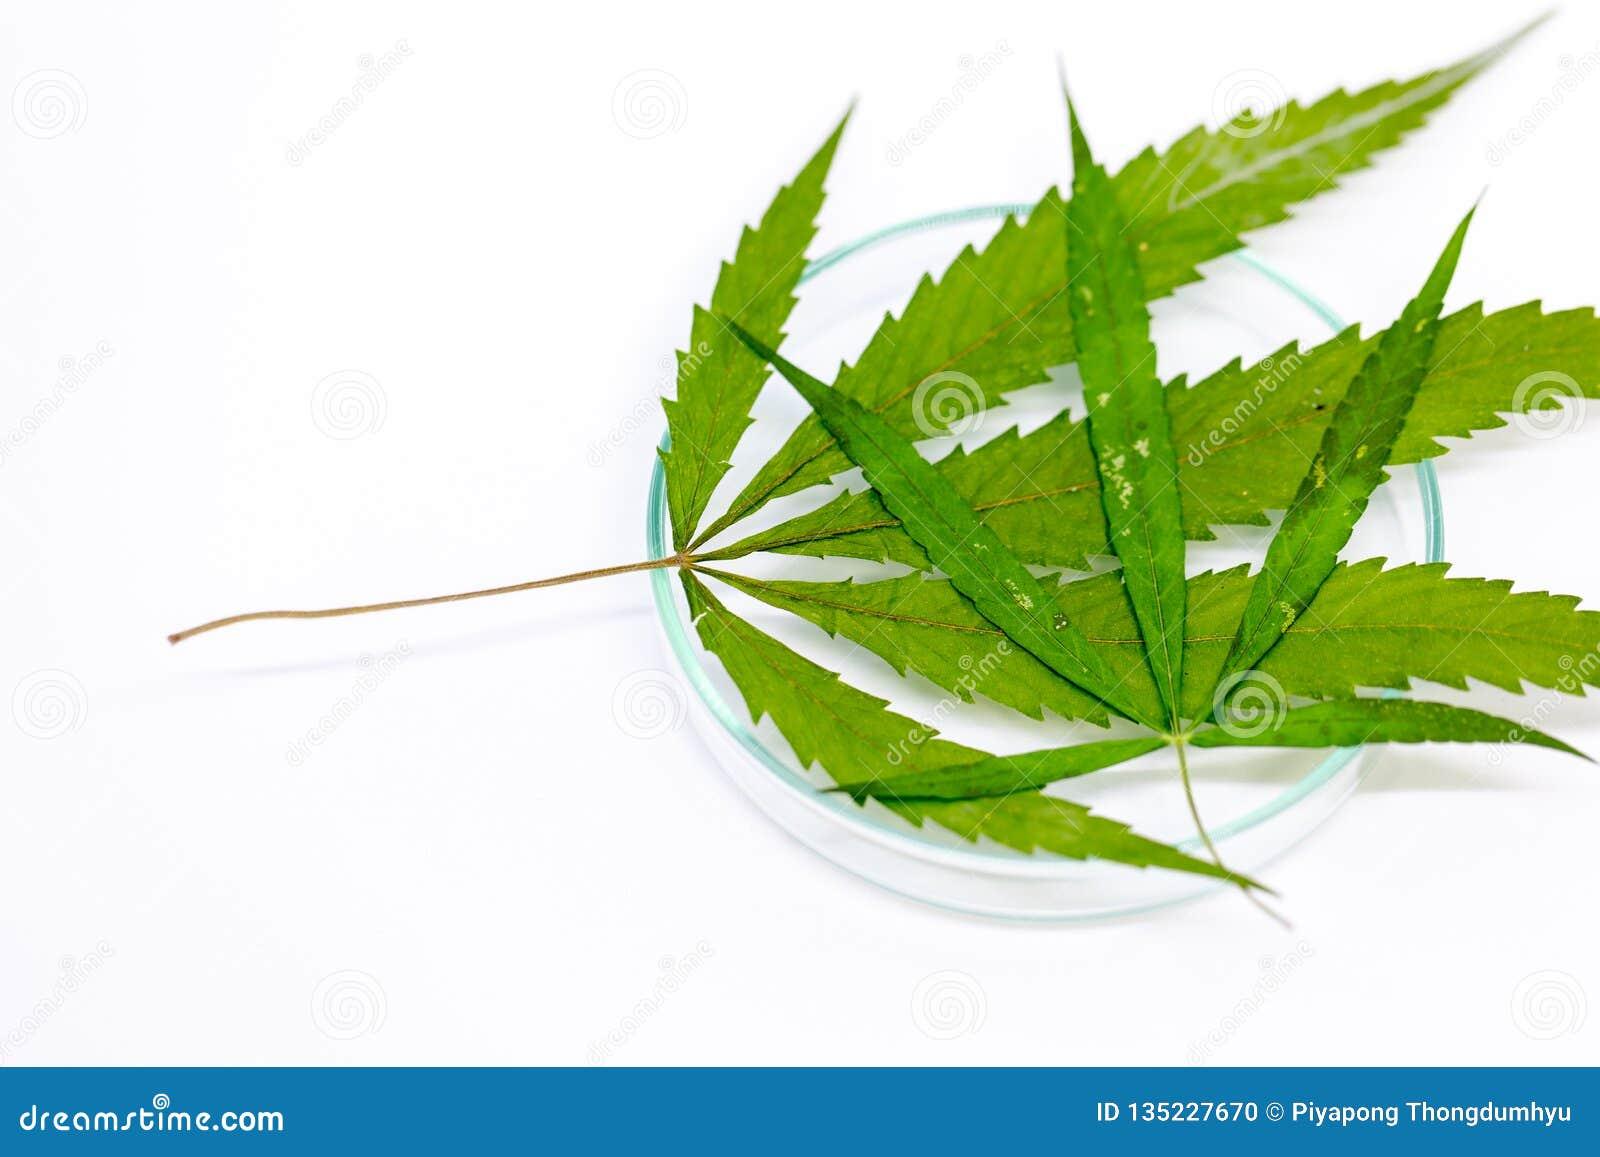 Cannabisdrugs, Analyse van Cannabis in laboratorium